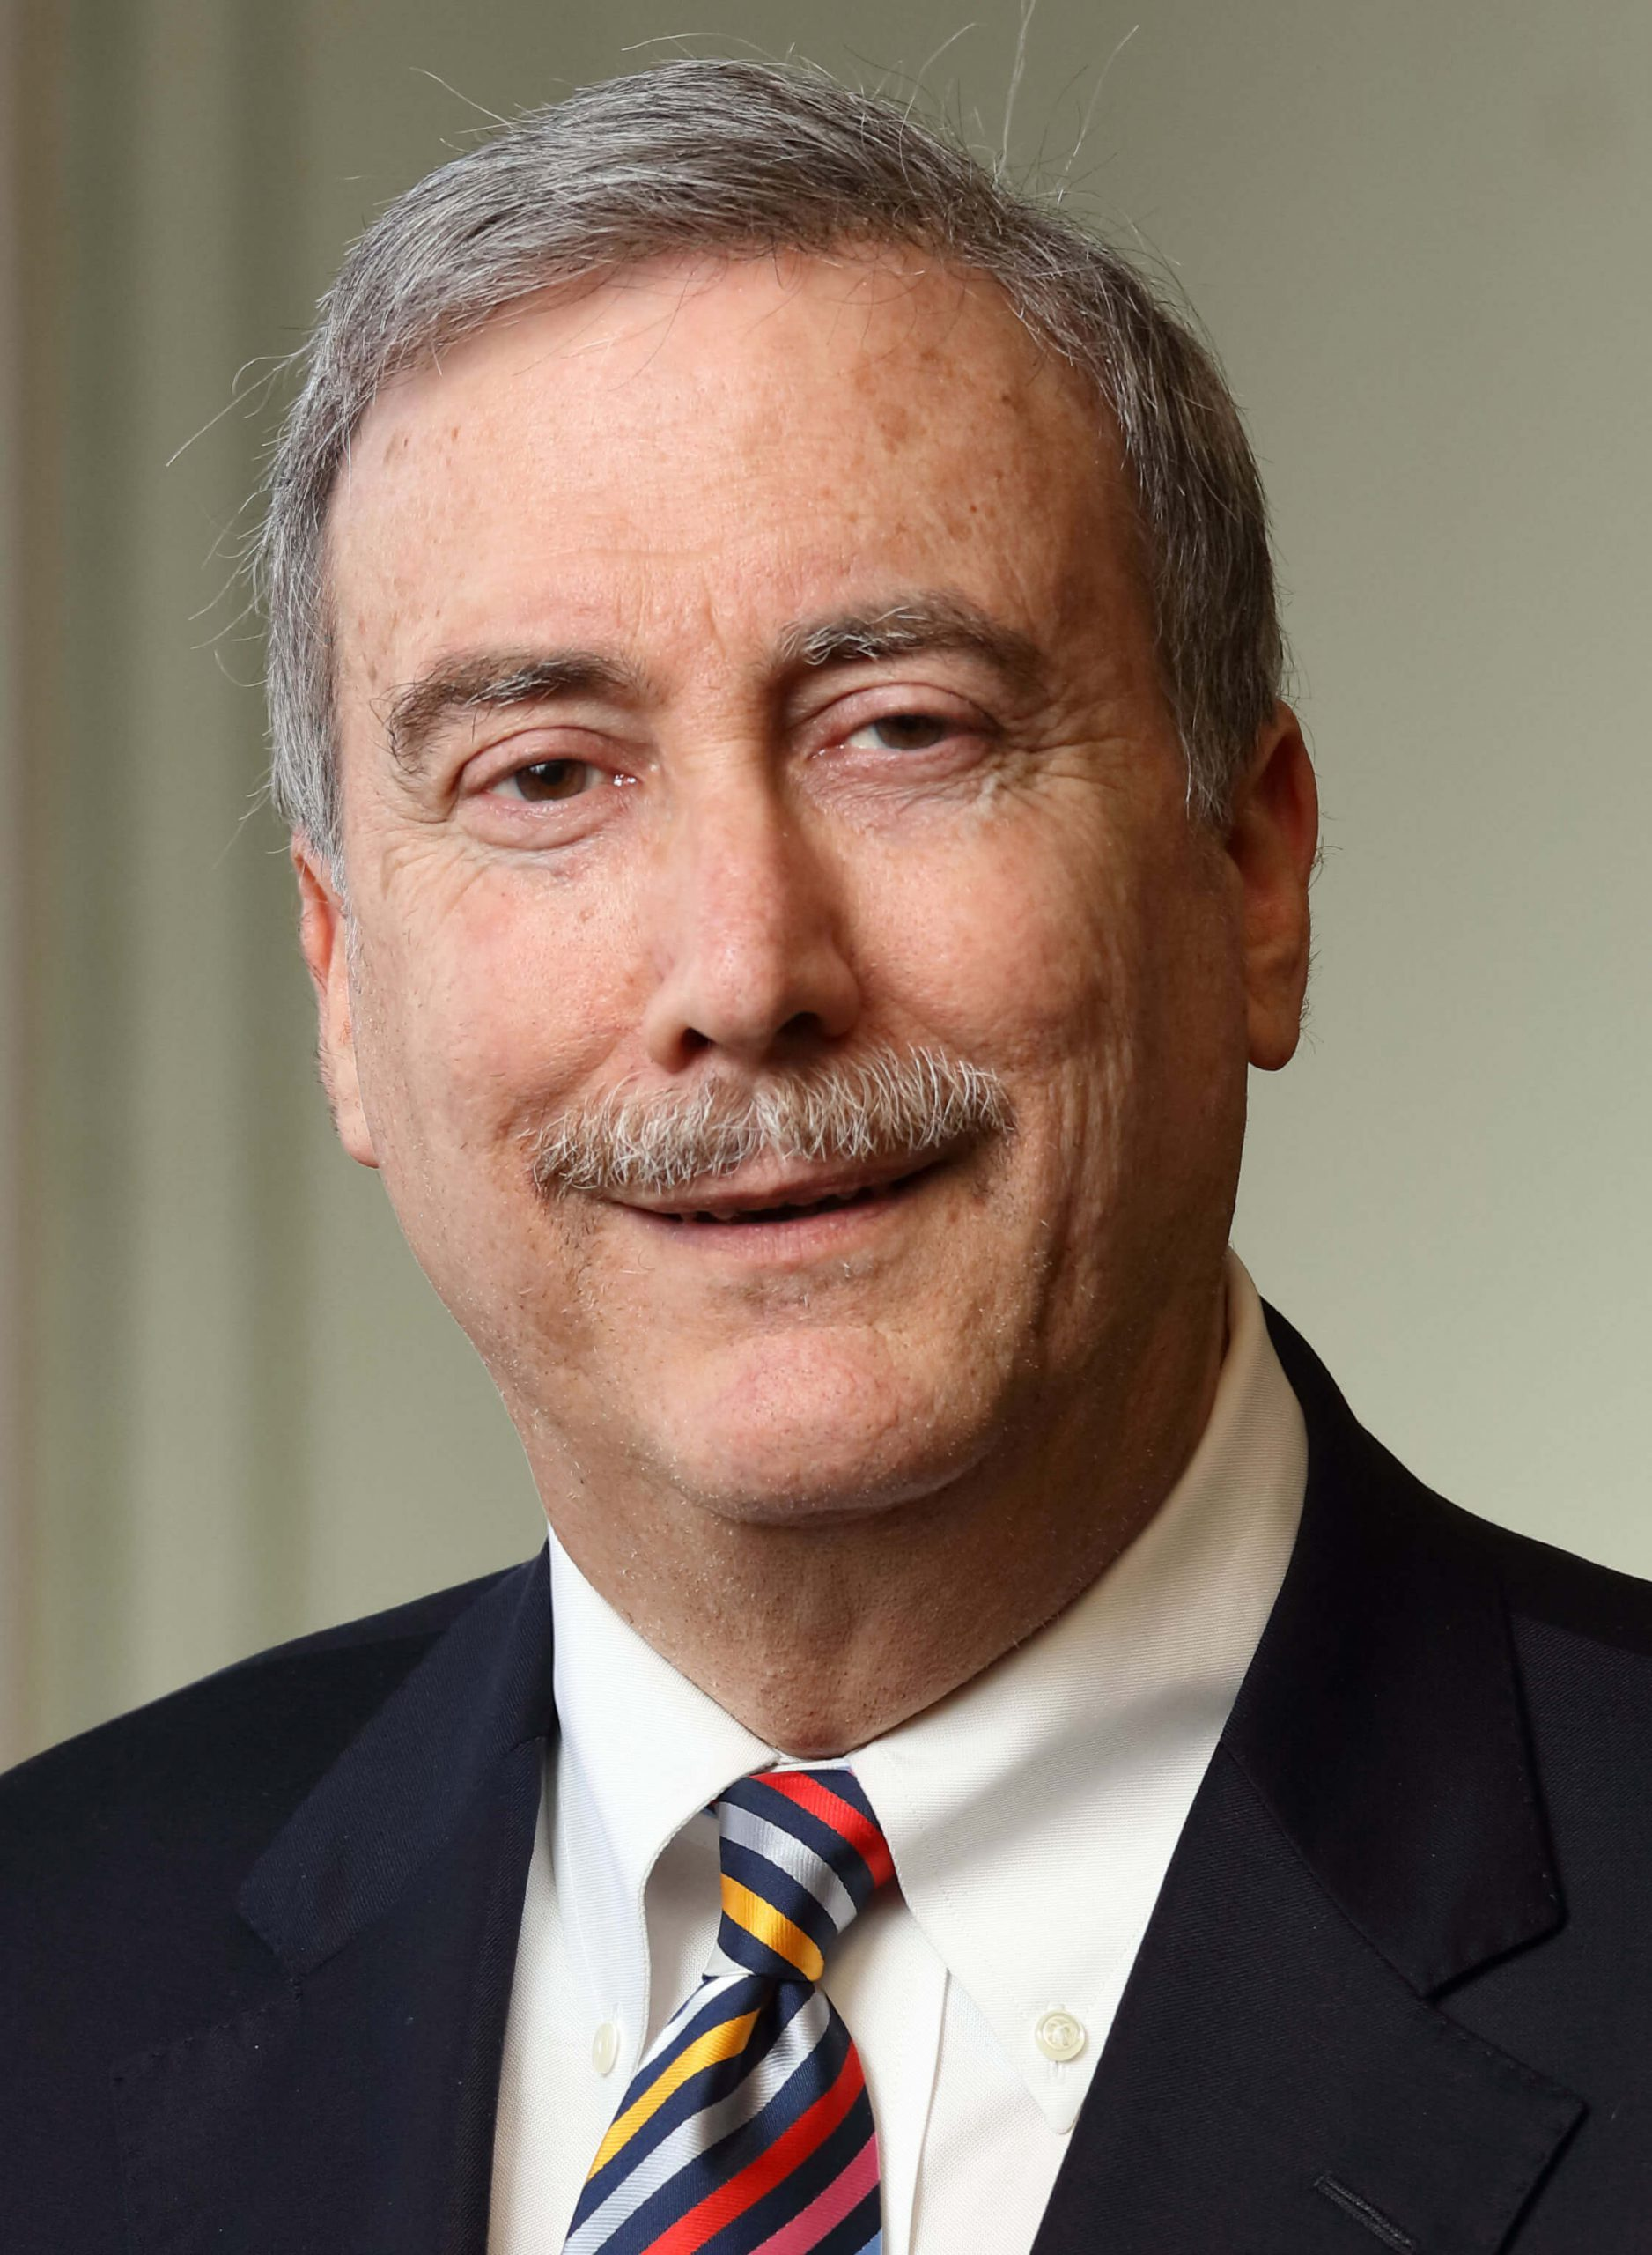 Larry-Sabato-speaker